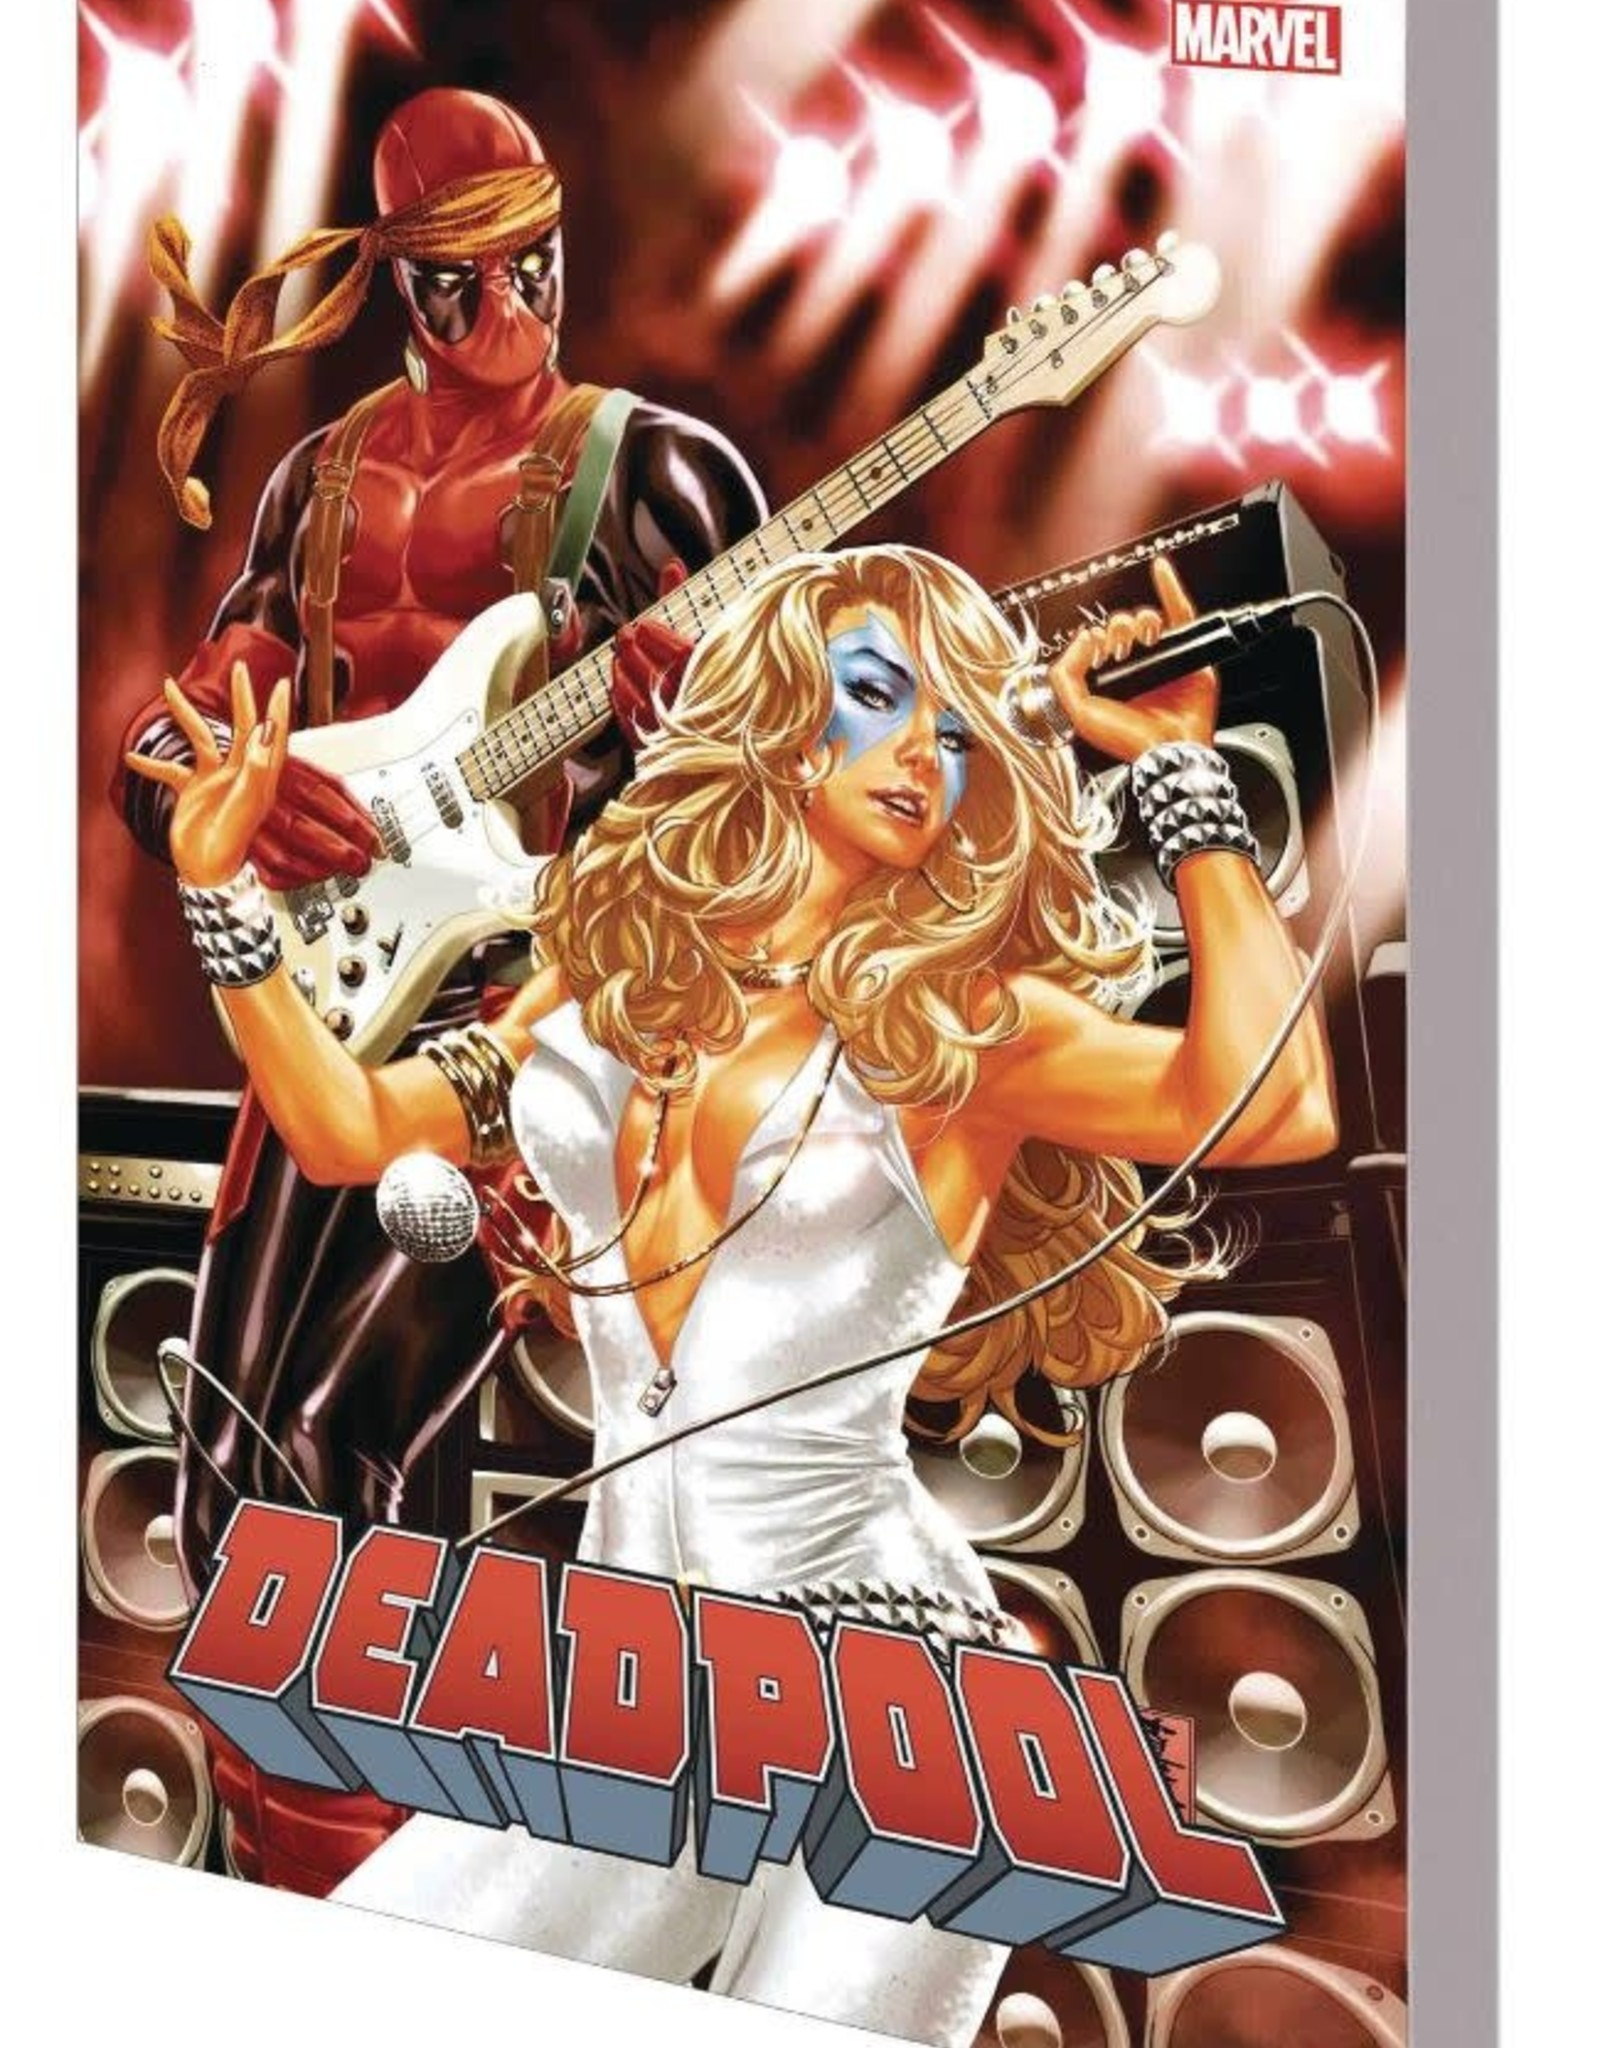 Marvel Comics Deadpool by Posehn & Duggan Complete Collection Vol 03